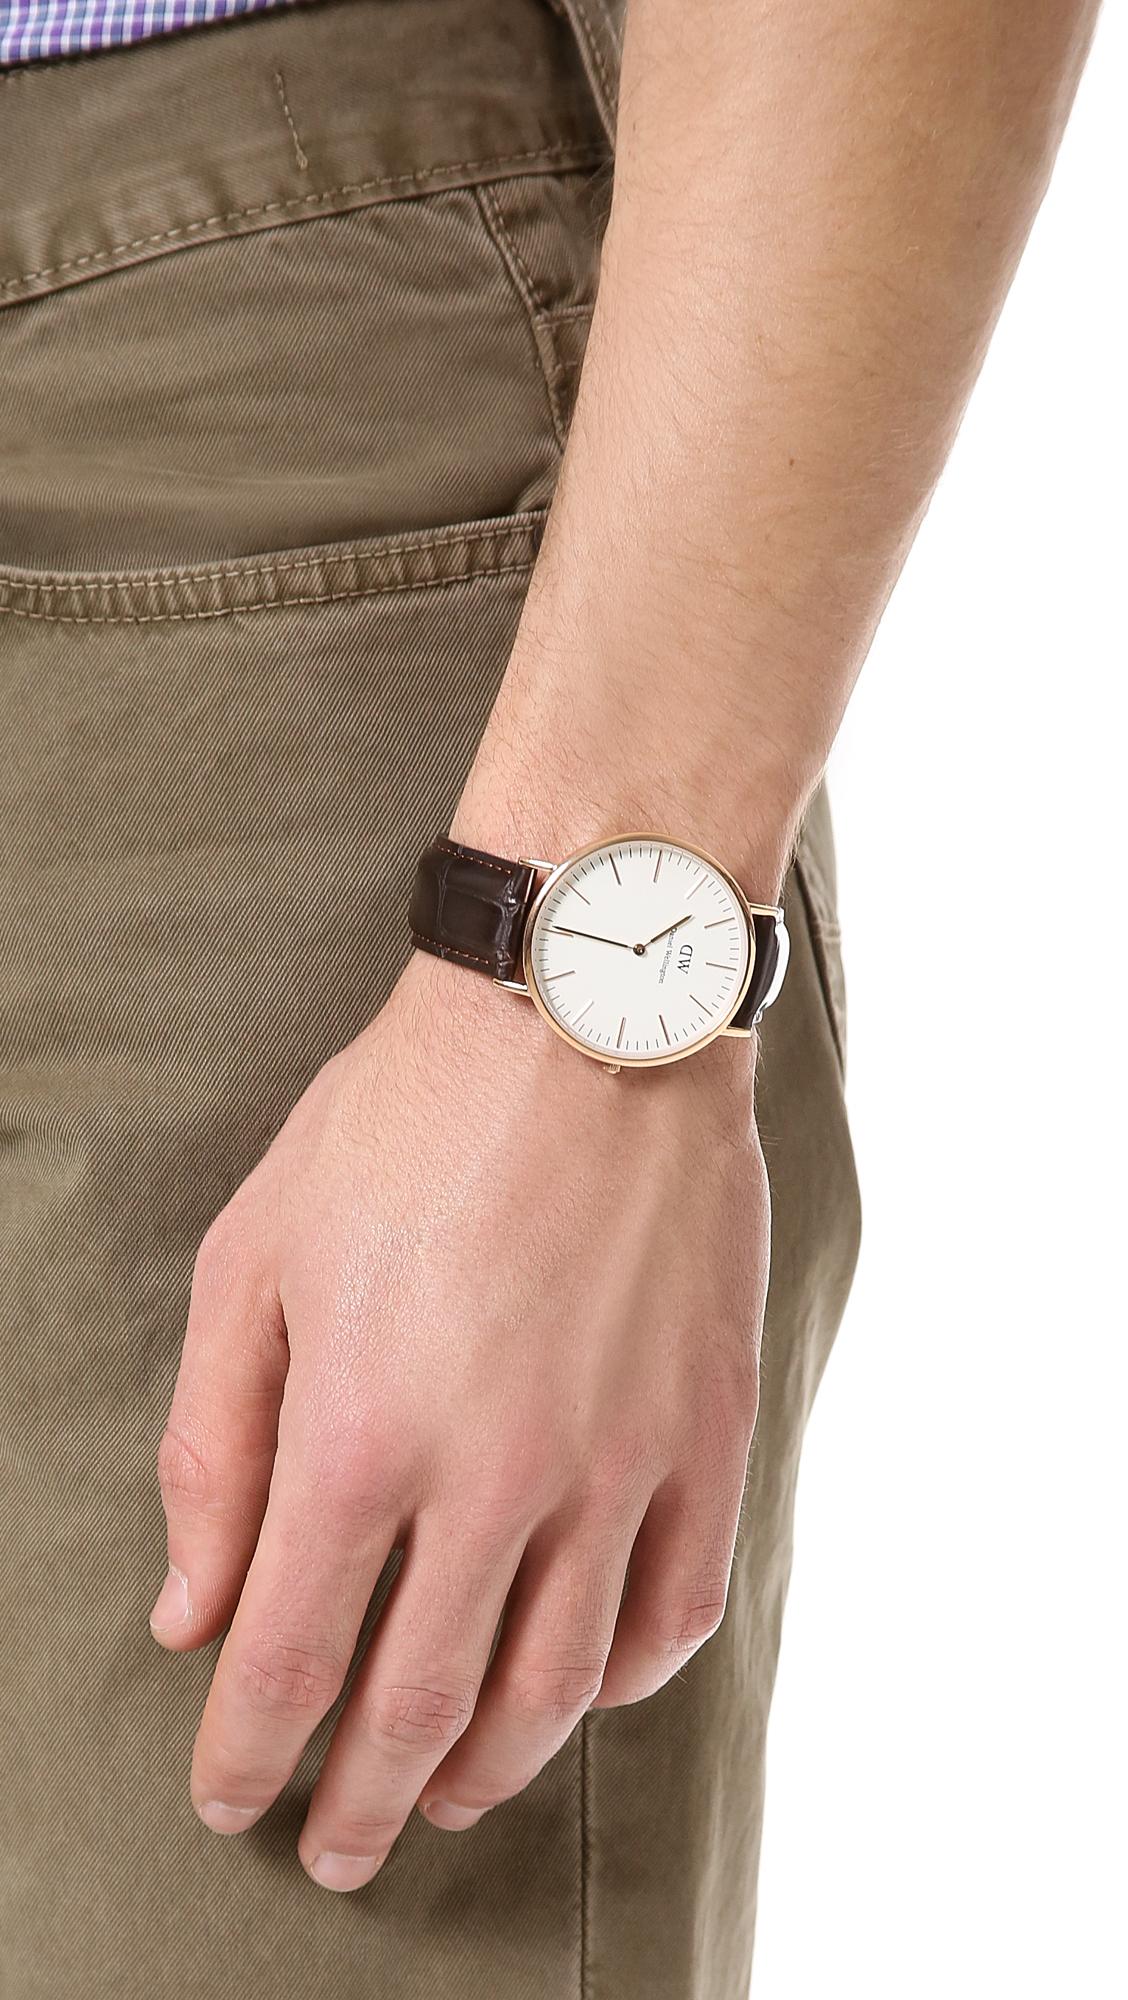 c3233c22caa2 Daniel Wellington York 40mm Watch